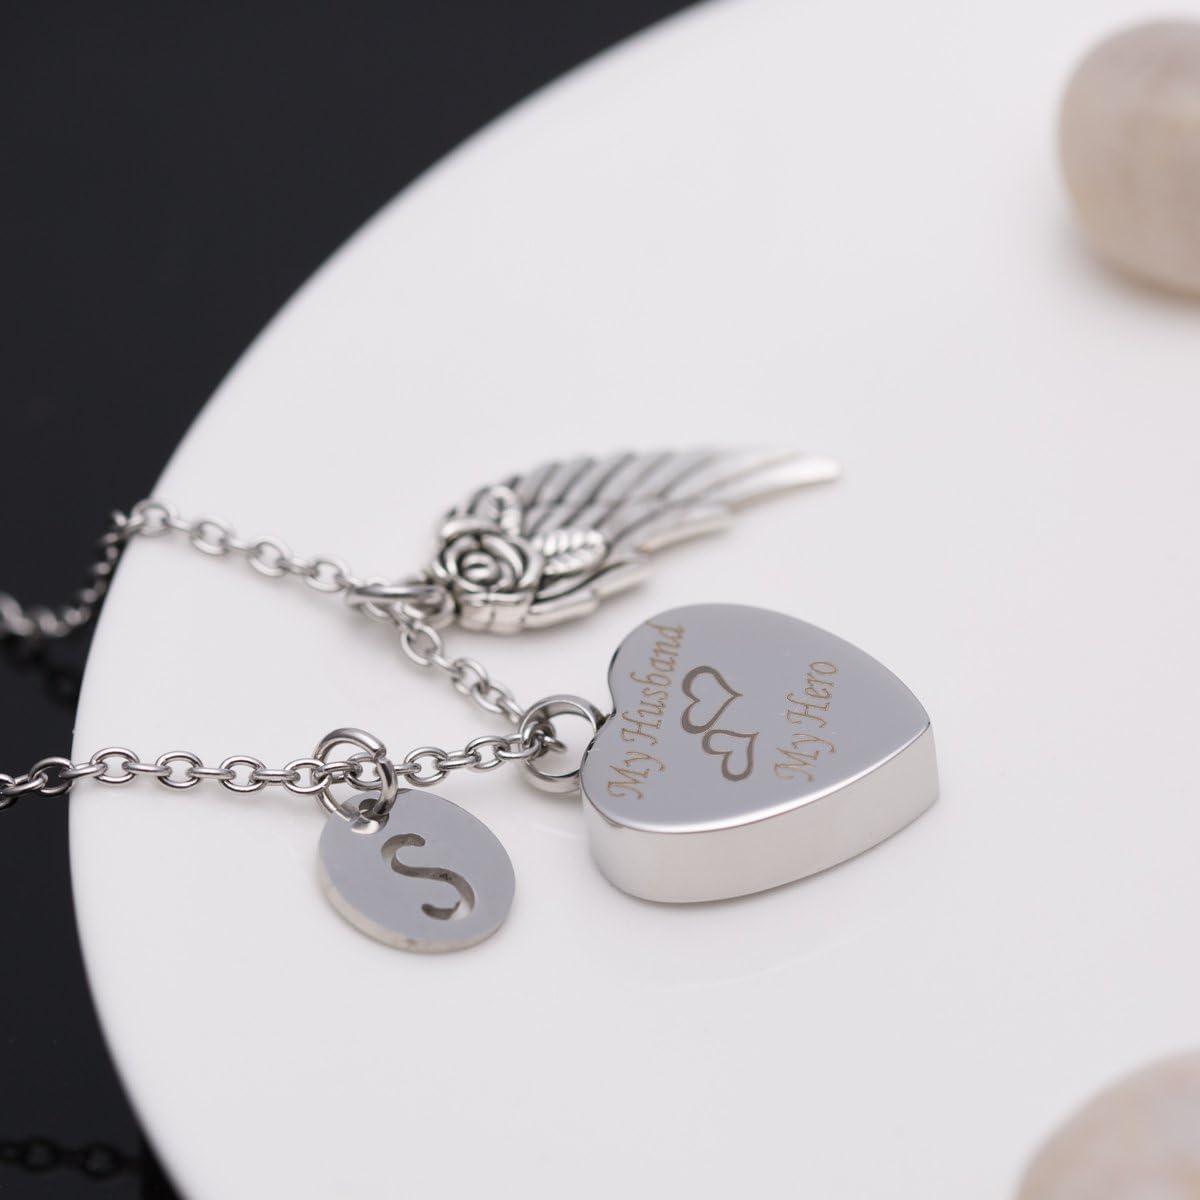 Cremation Urn Jewelry My Husband My Hero Angel Wings 26 Alphabet Memorial Ash Keepsake Heart Necklace